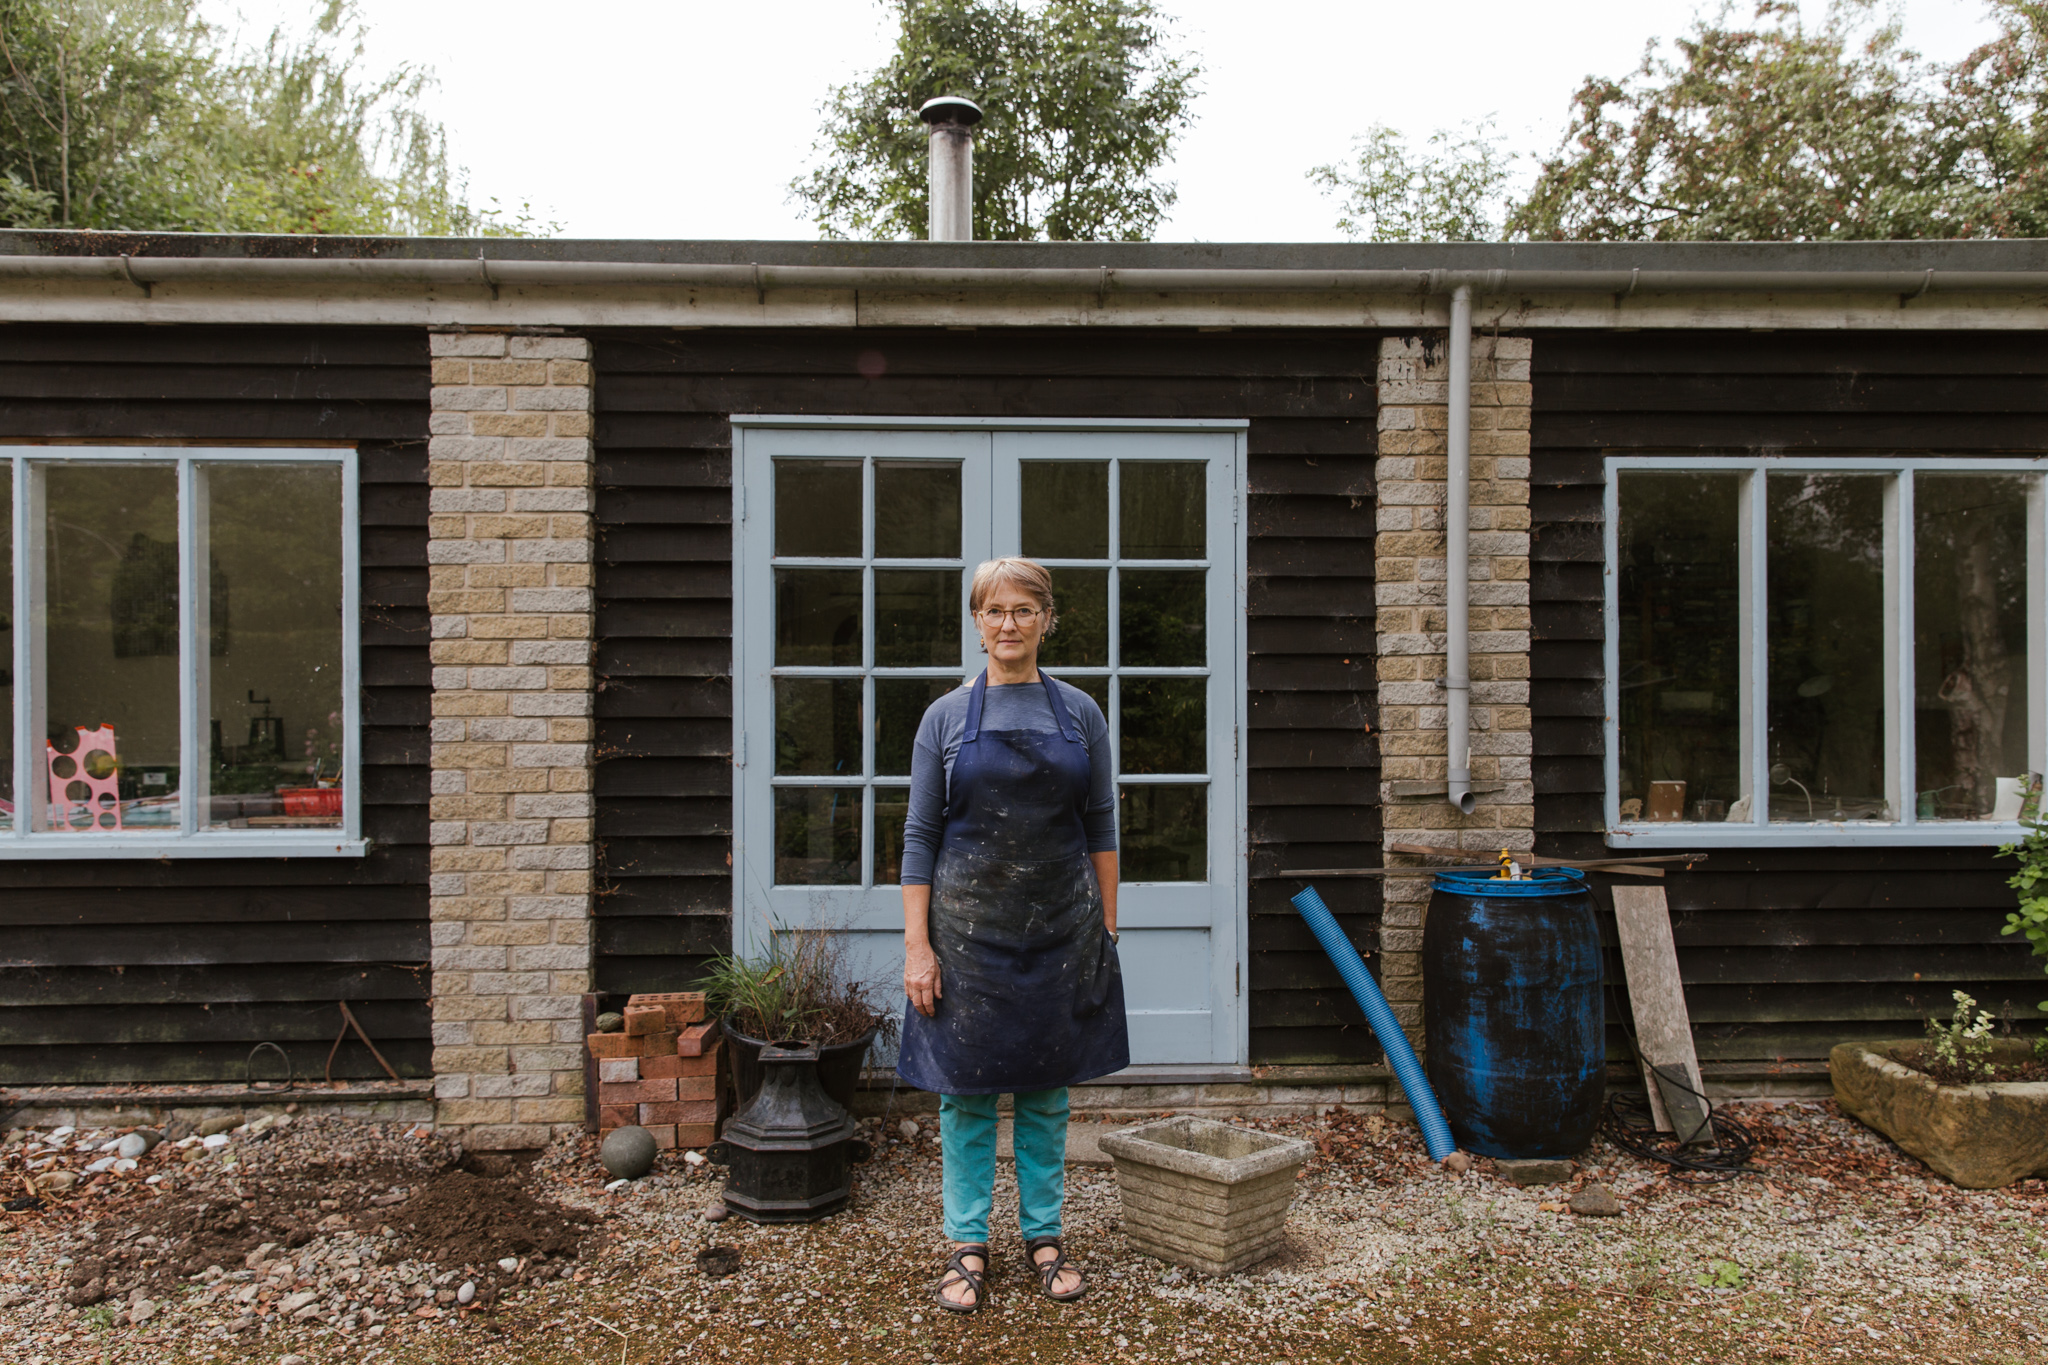 Lifestyle-artist-studio-Joanne-Crawford-Leeds-25.JPG